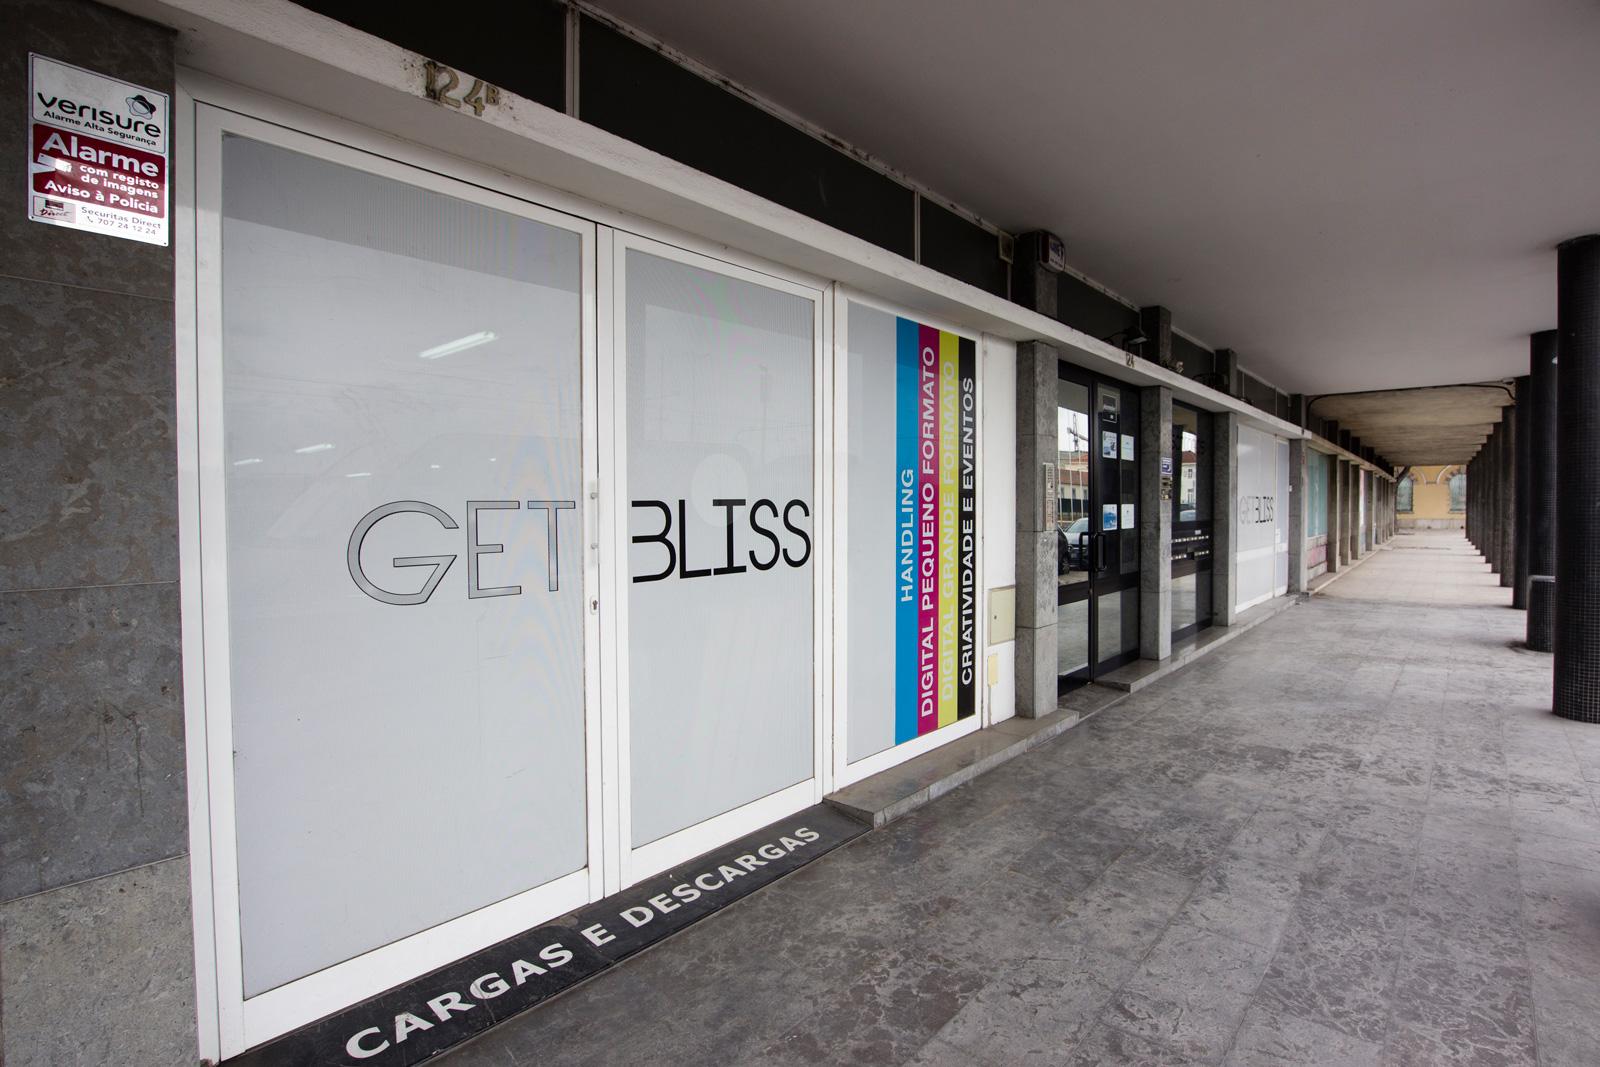 get-bliss-impressao-2